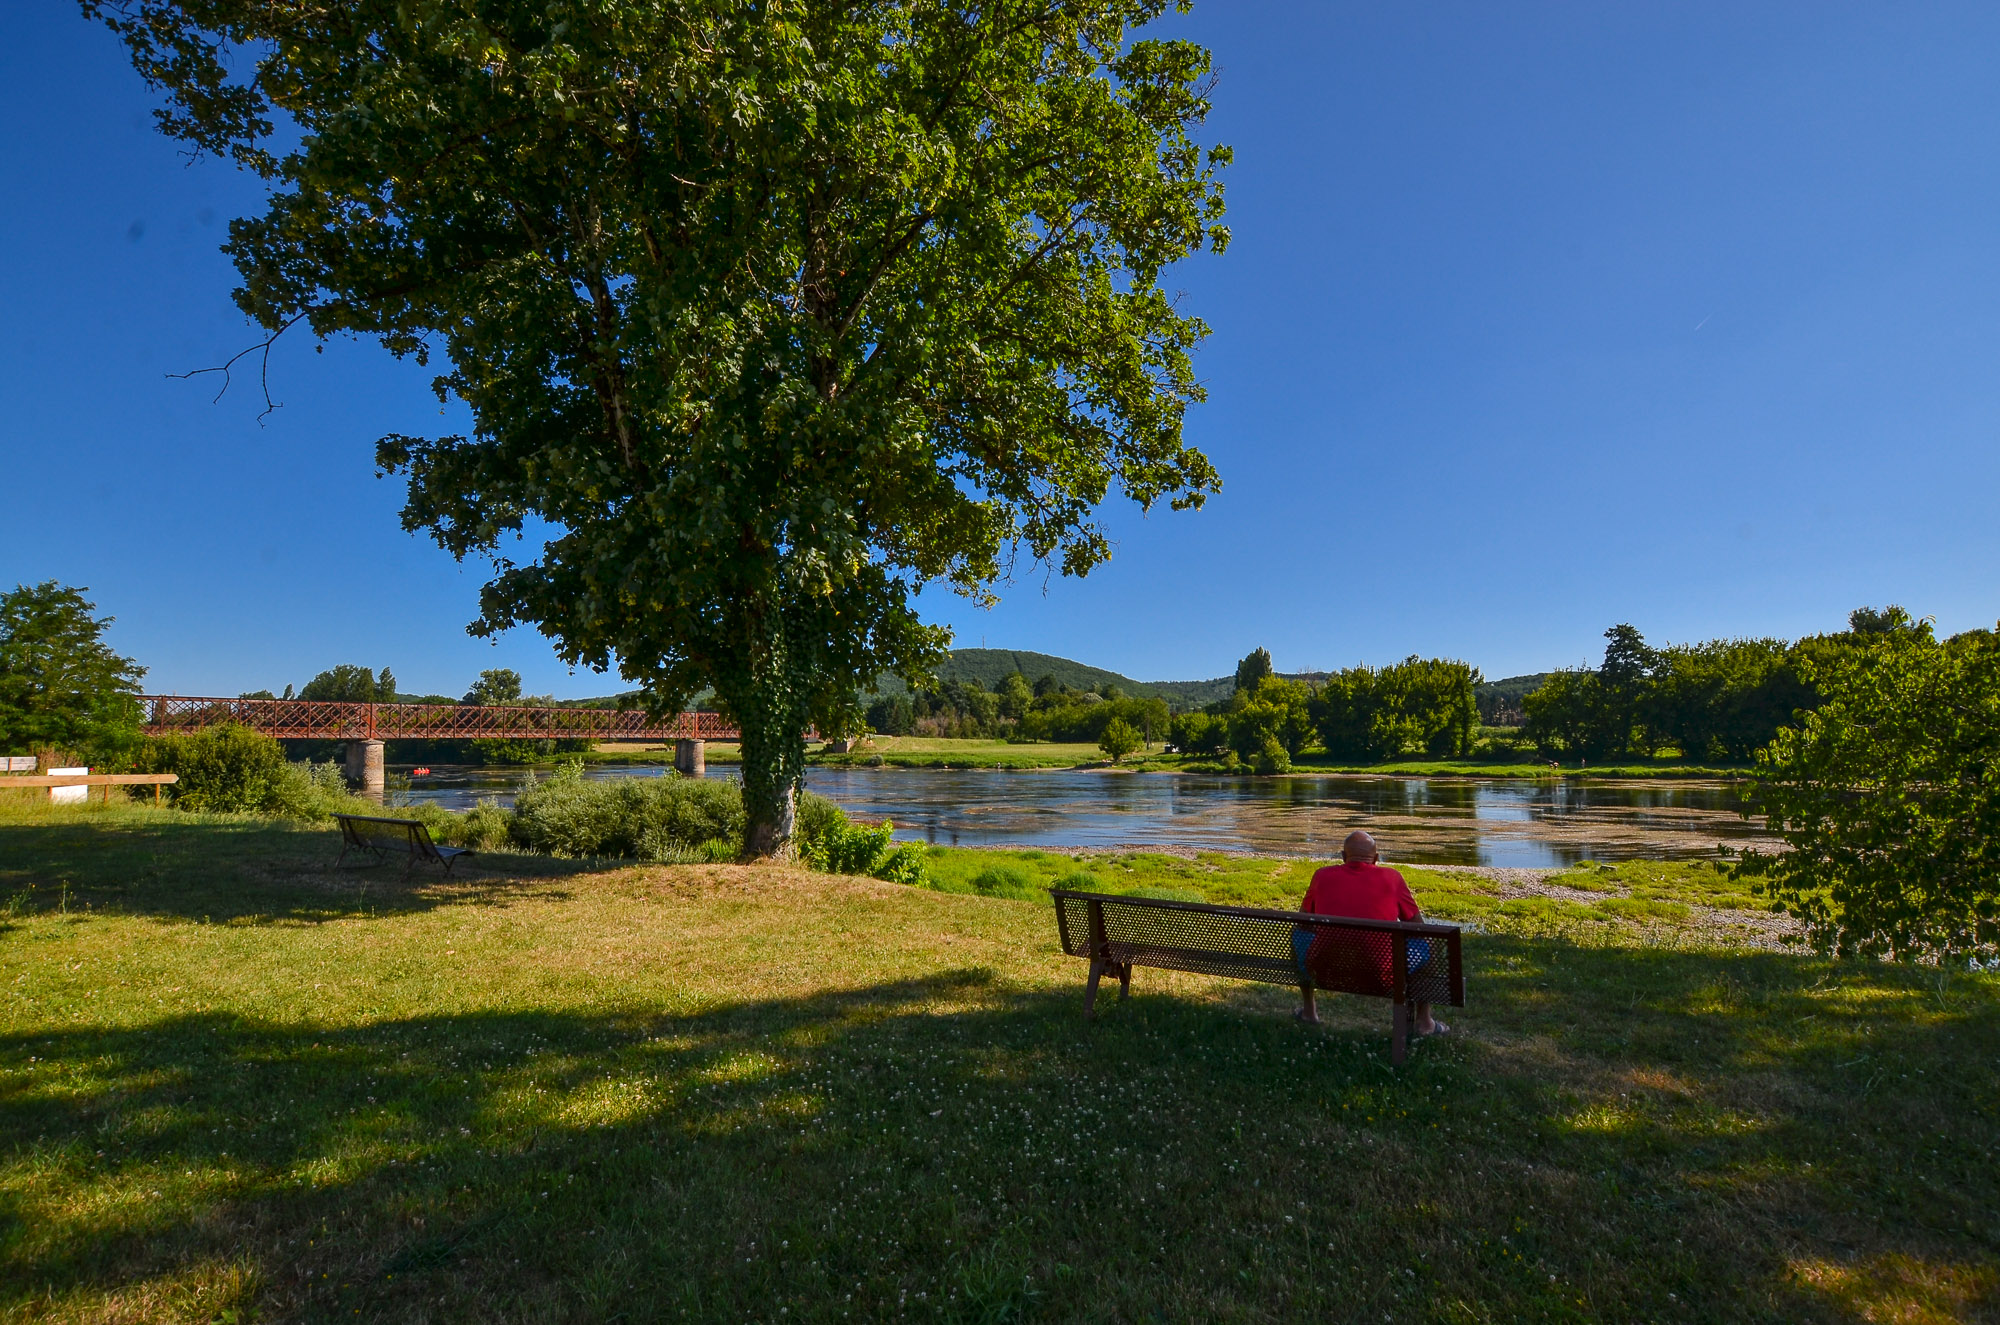 campsite in Dordogne